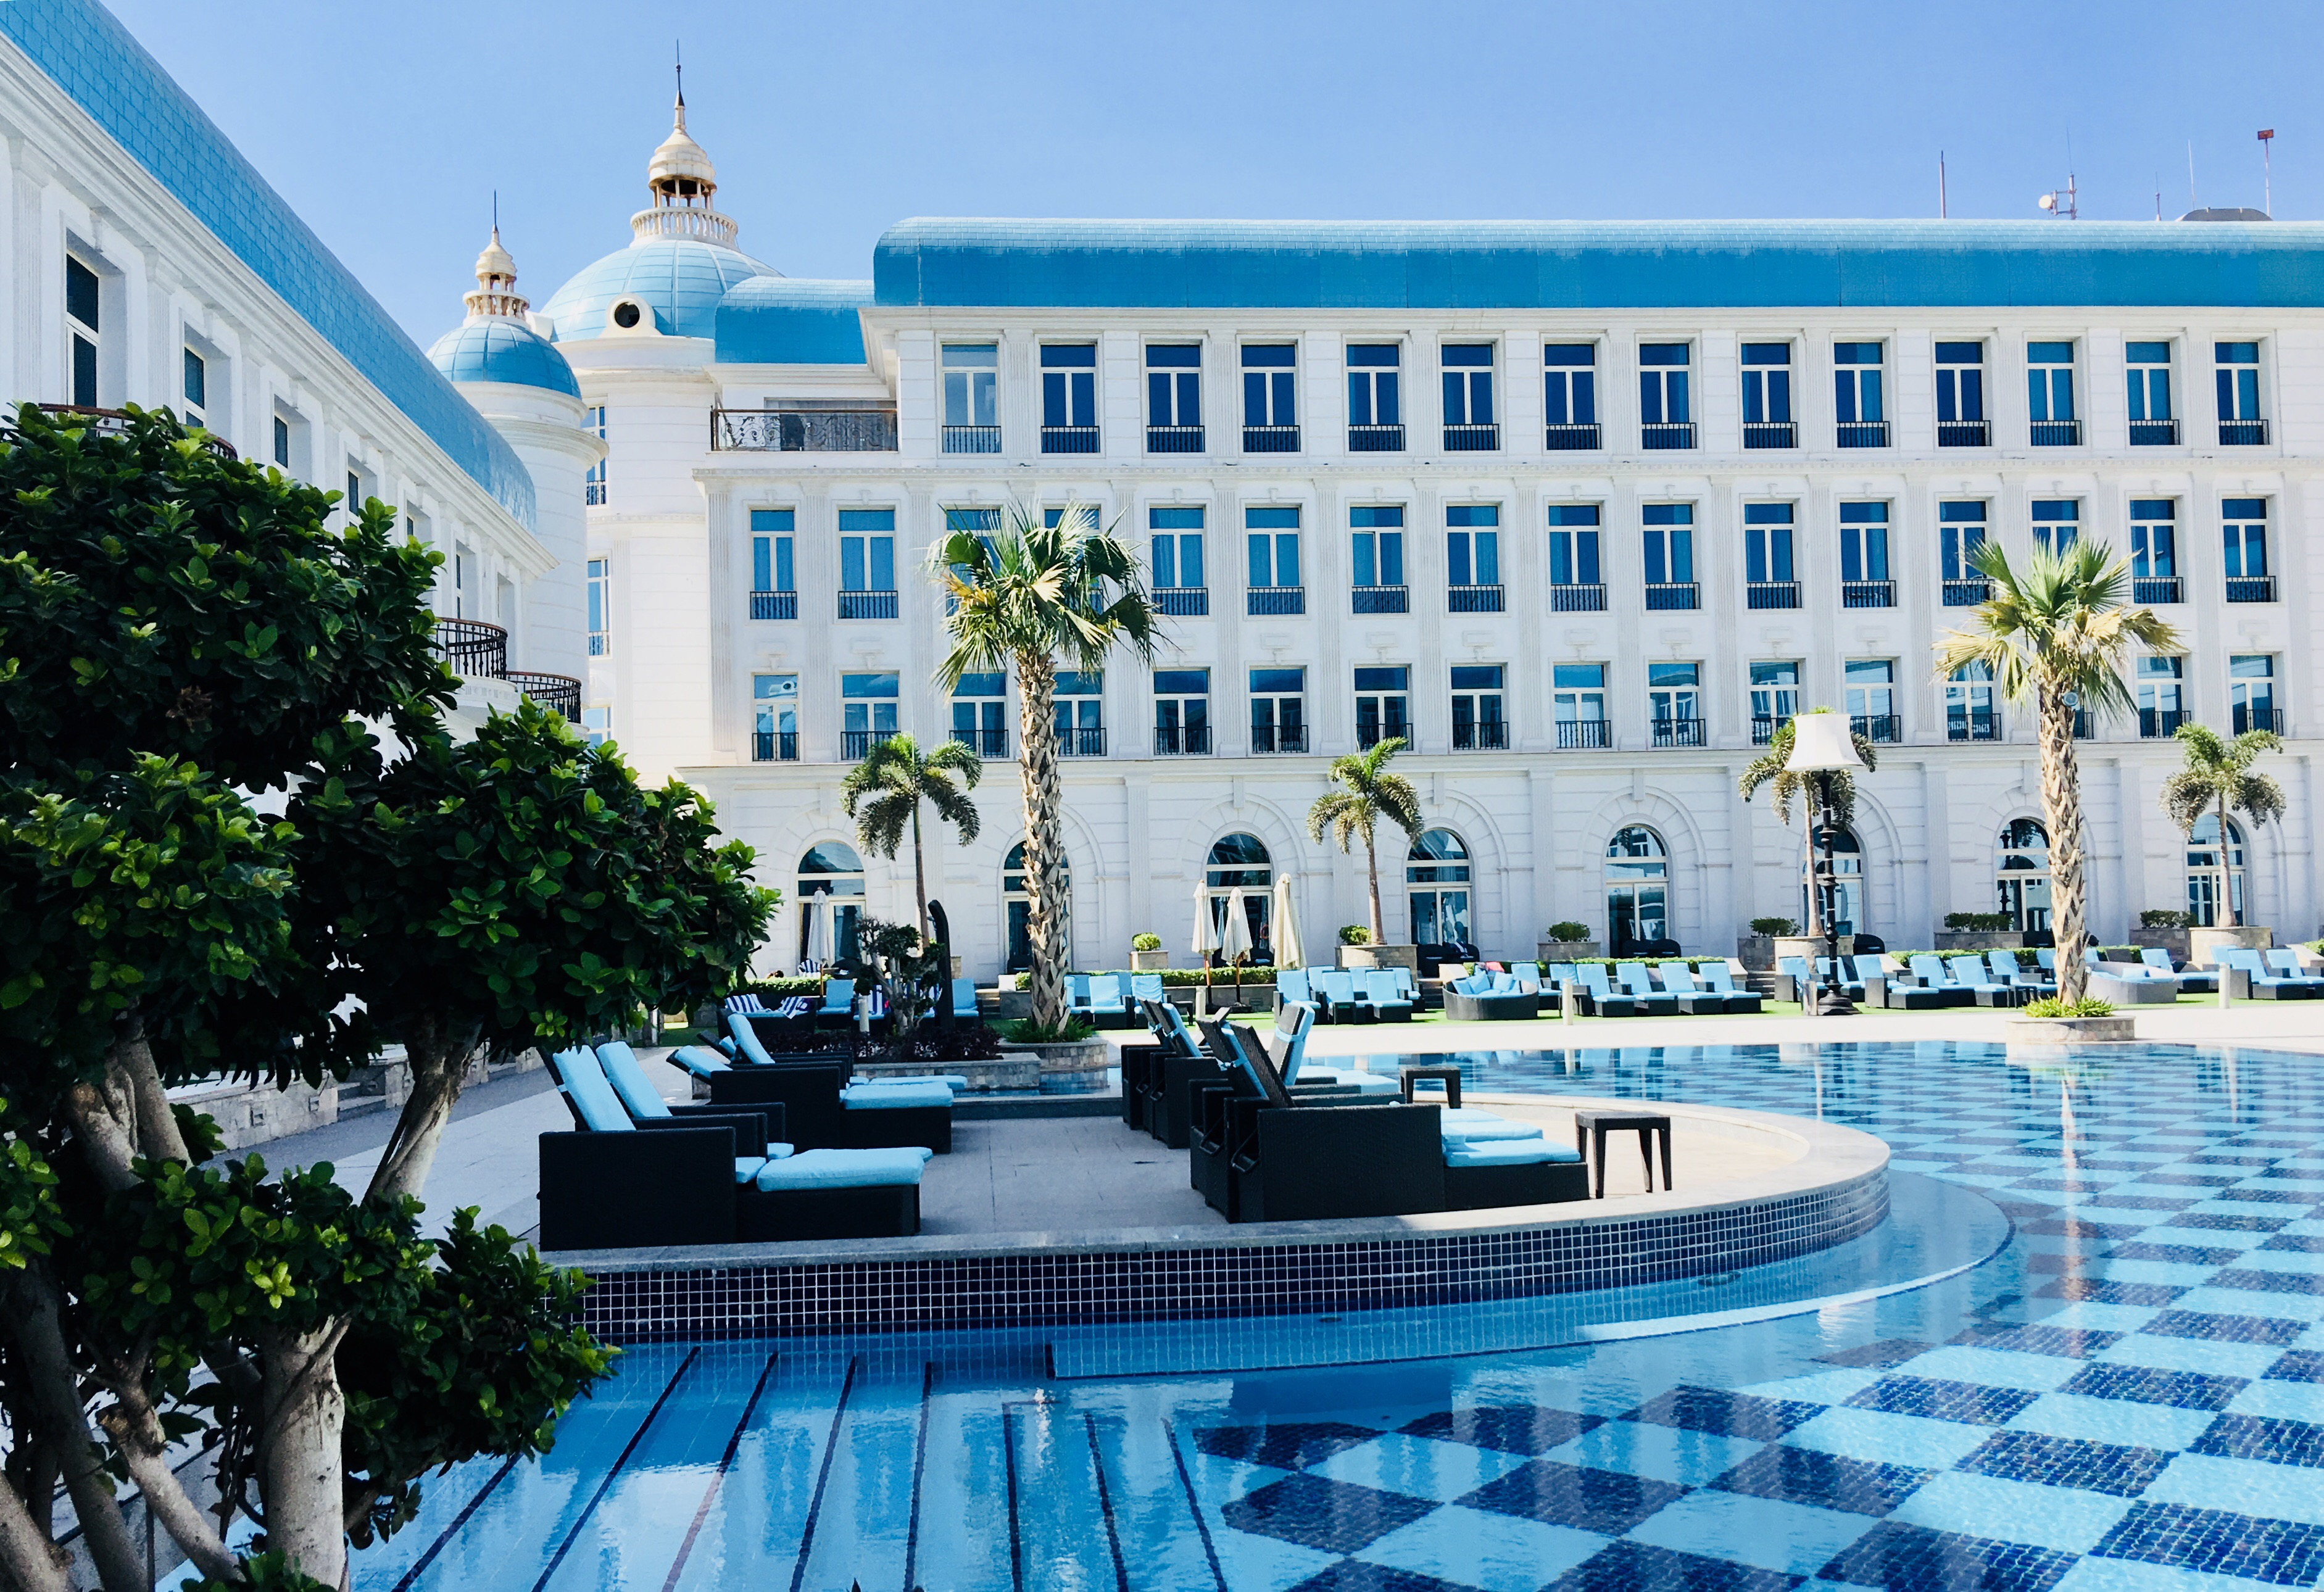 Staycation Package at the Royal Maxim Palace Kempinski, Cairo – Eat ...